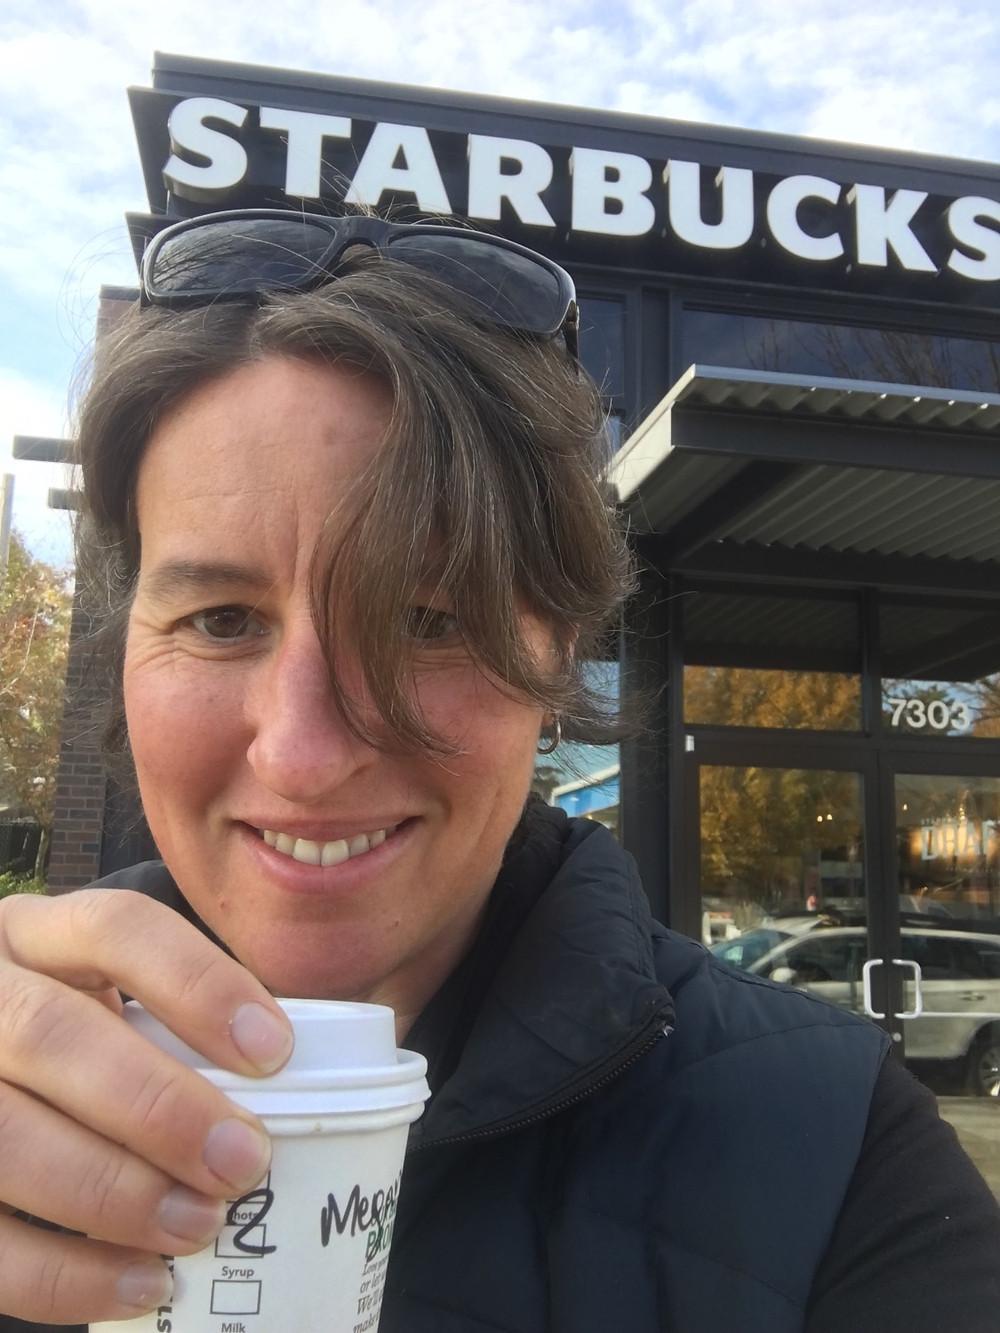 Megan at Starbucks